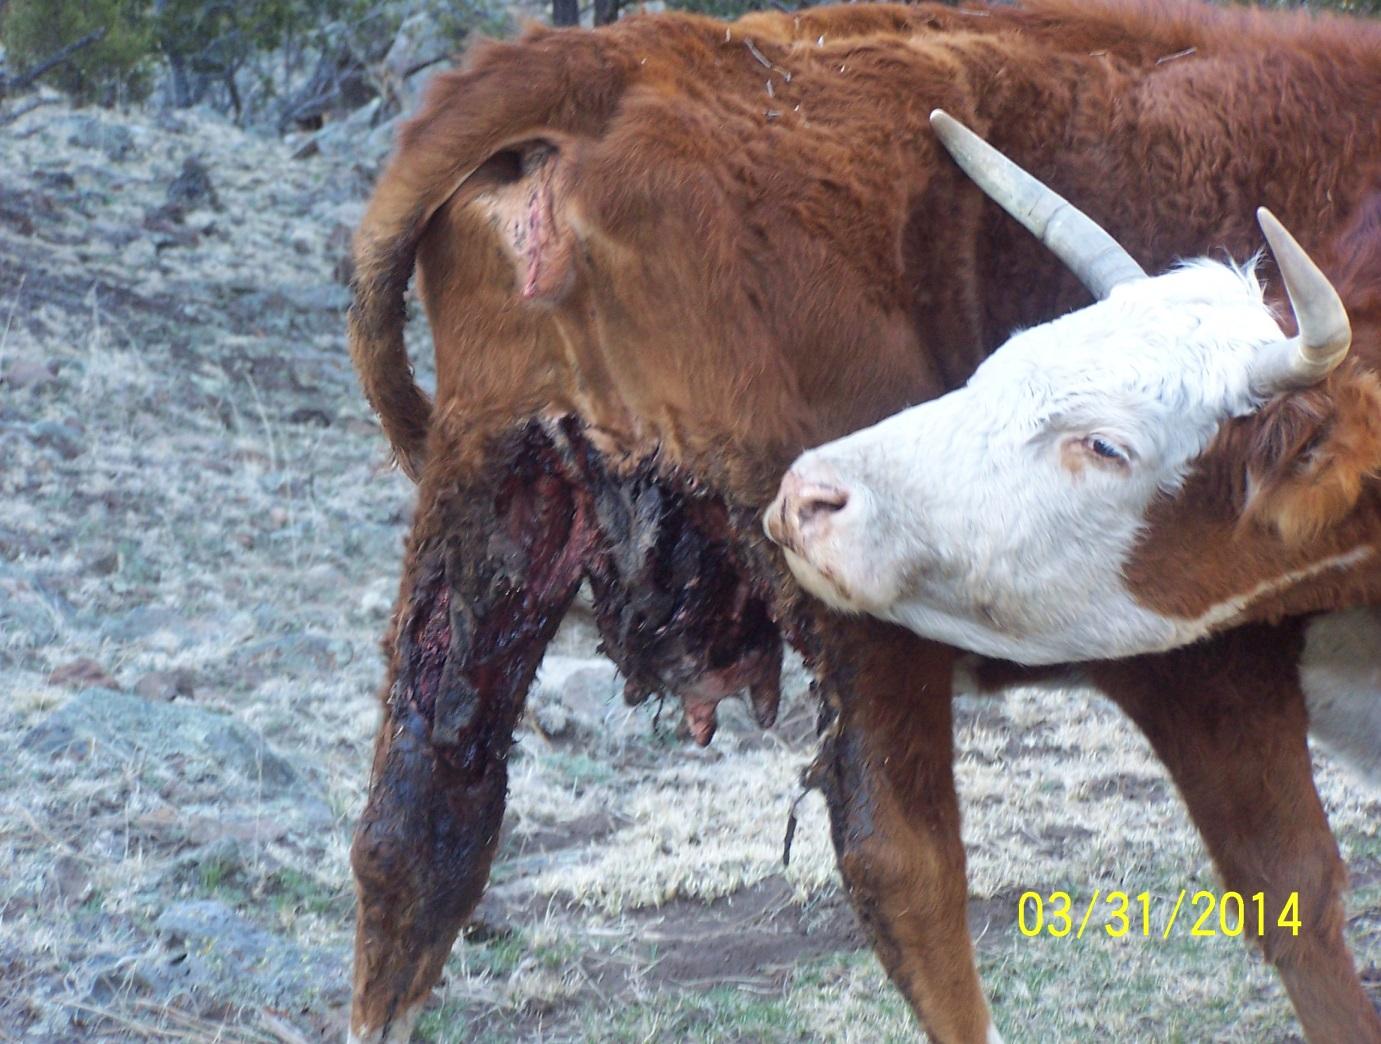 pitbull attacks cow